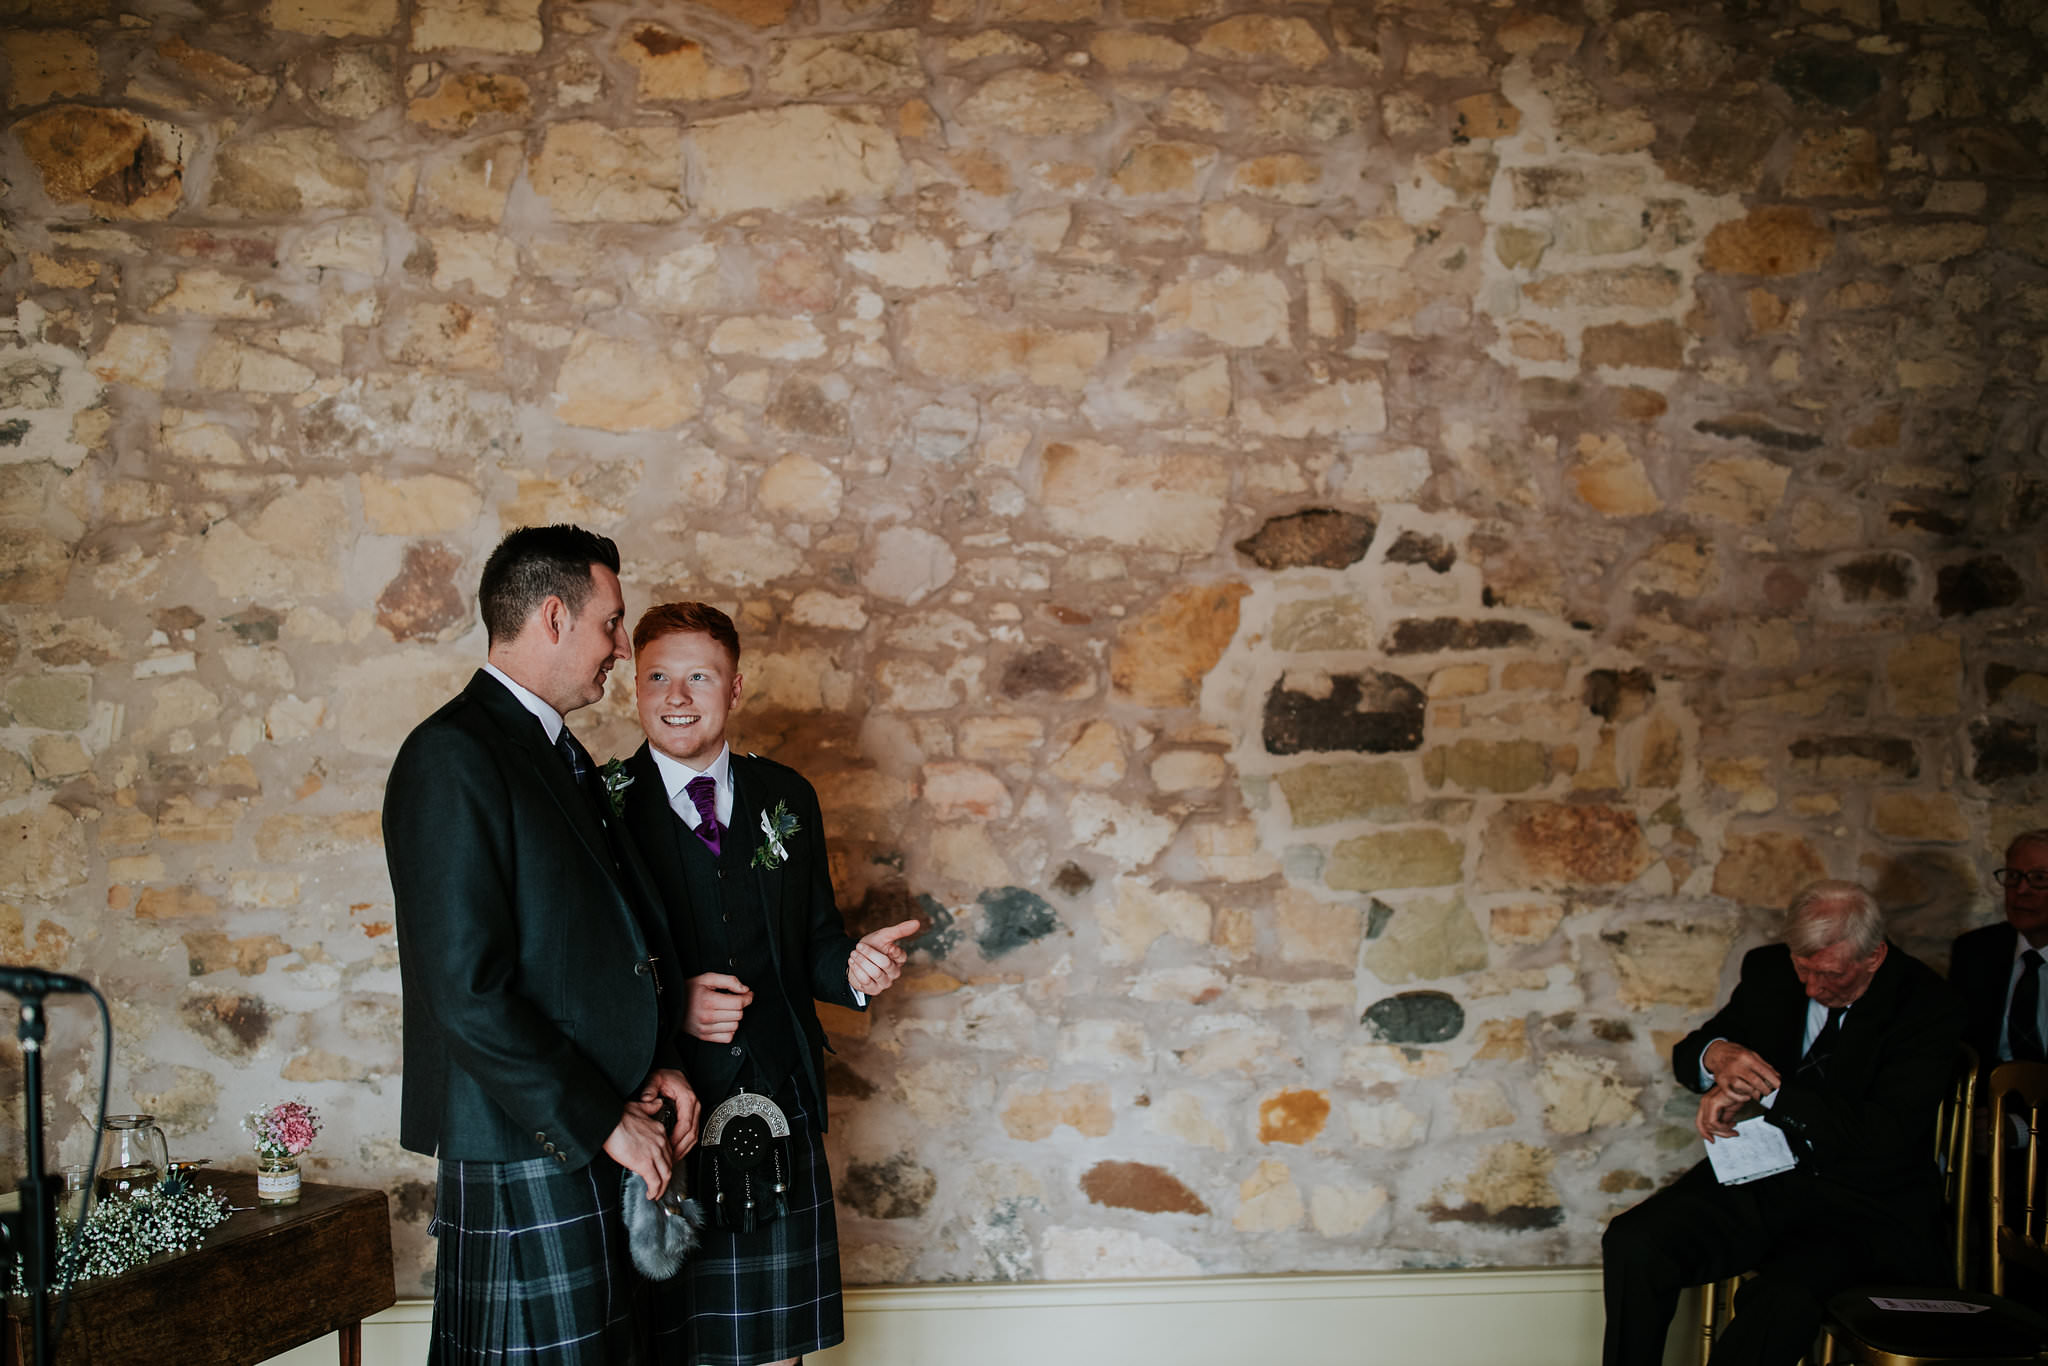 kirknewton stables wedding photographer (27).jpg